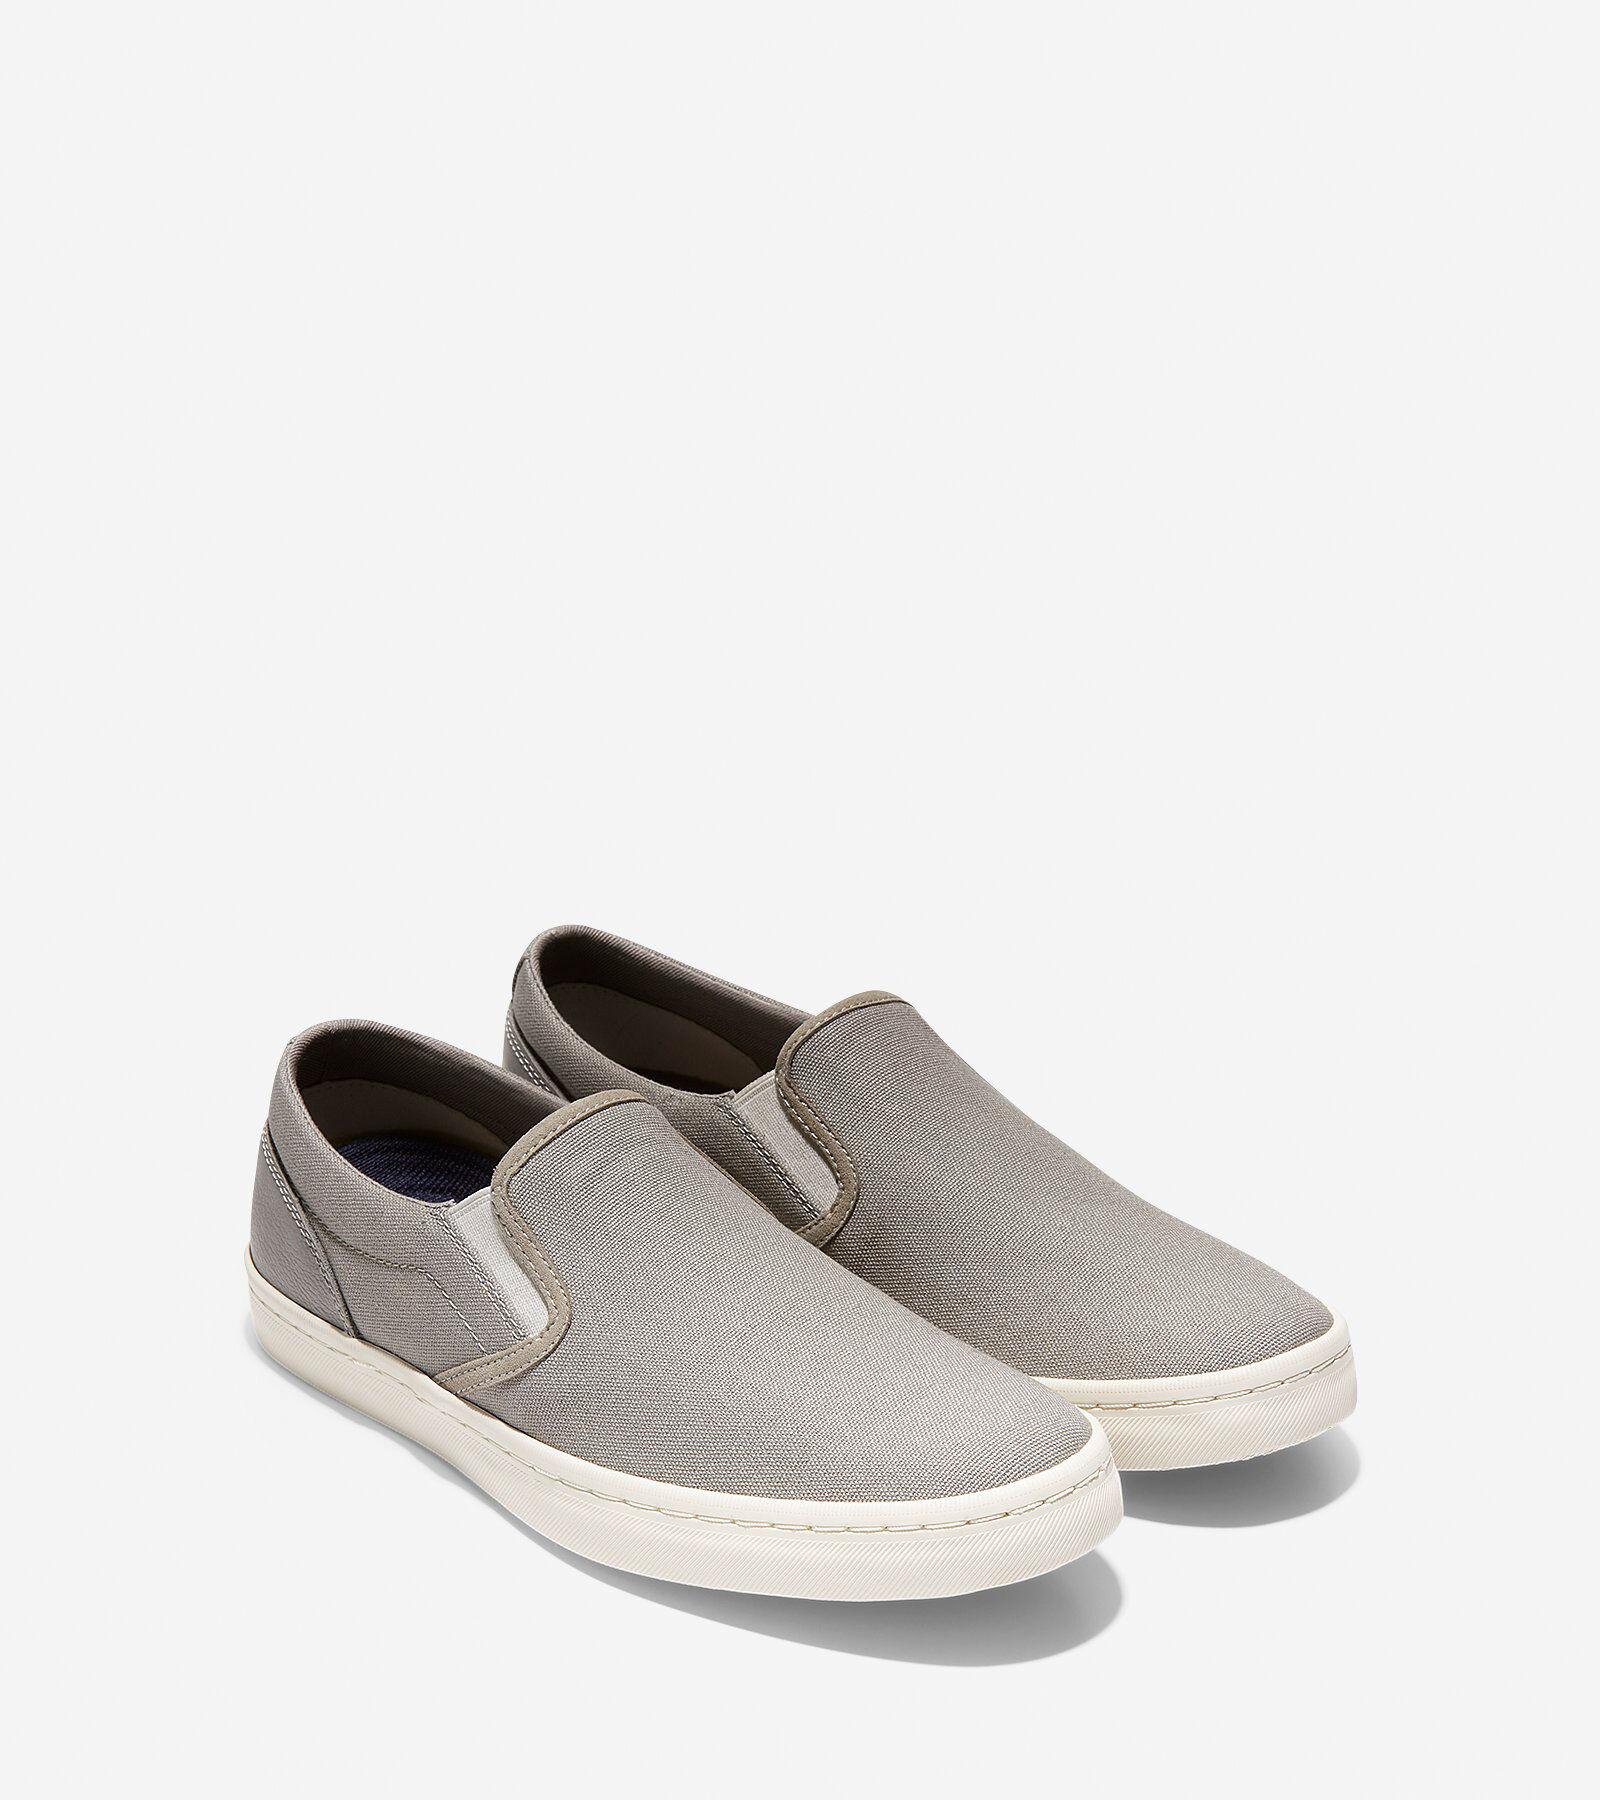 Men's Nantucket Deck Slip-On Sneaker in